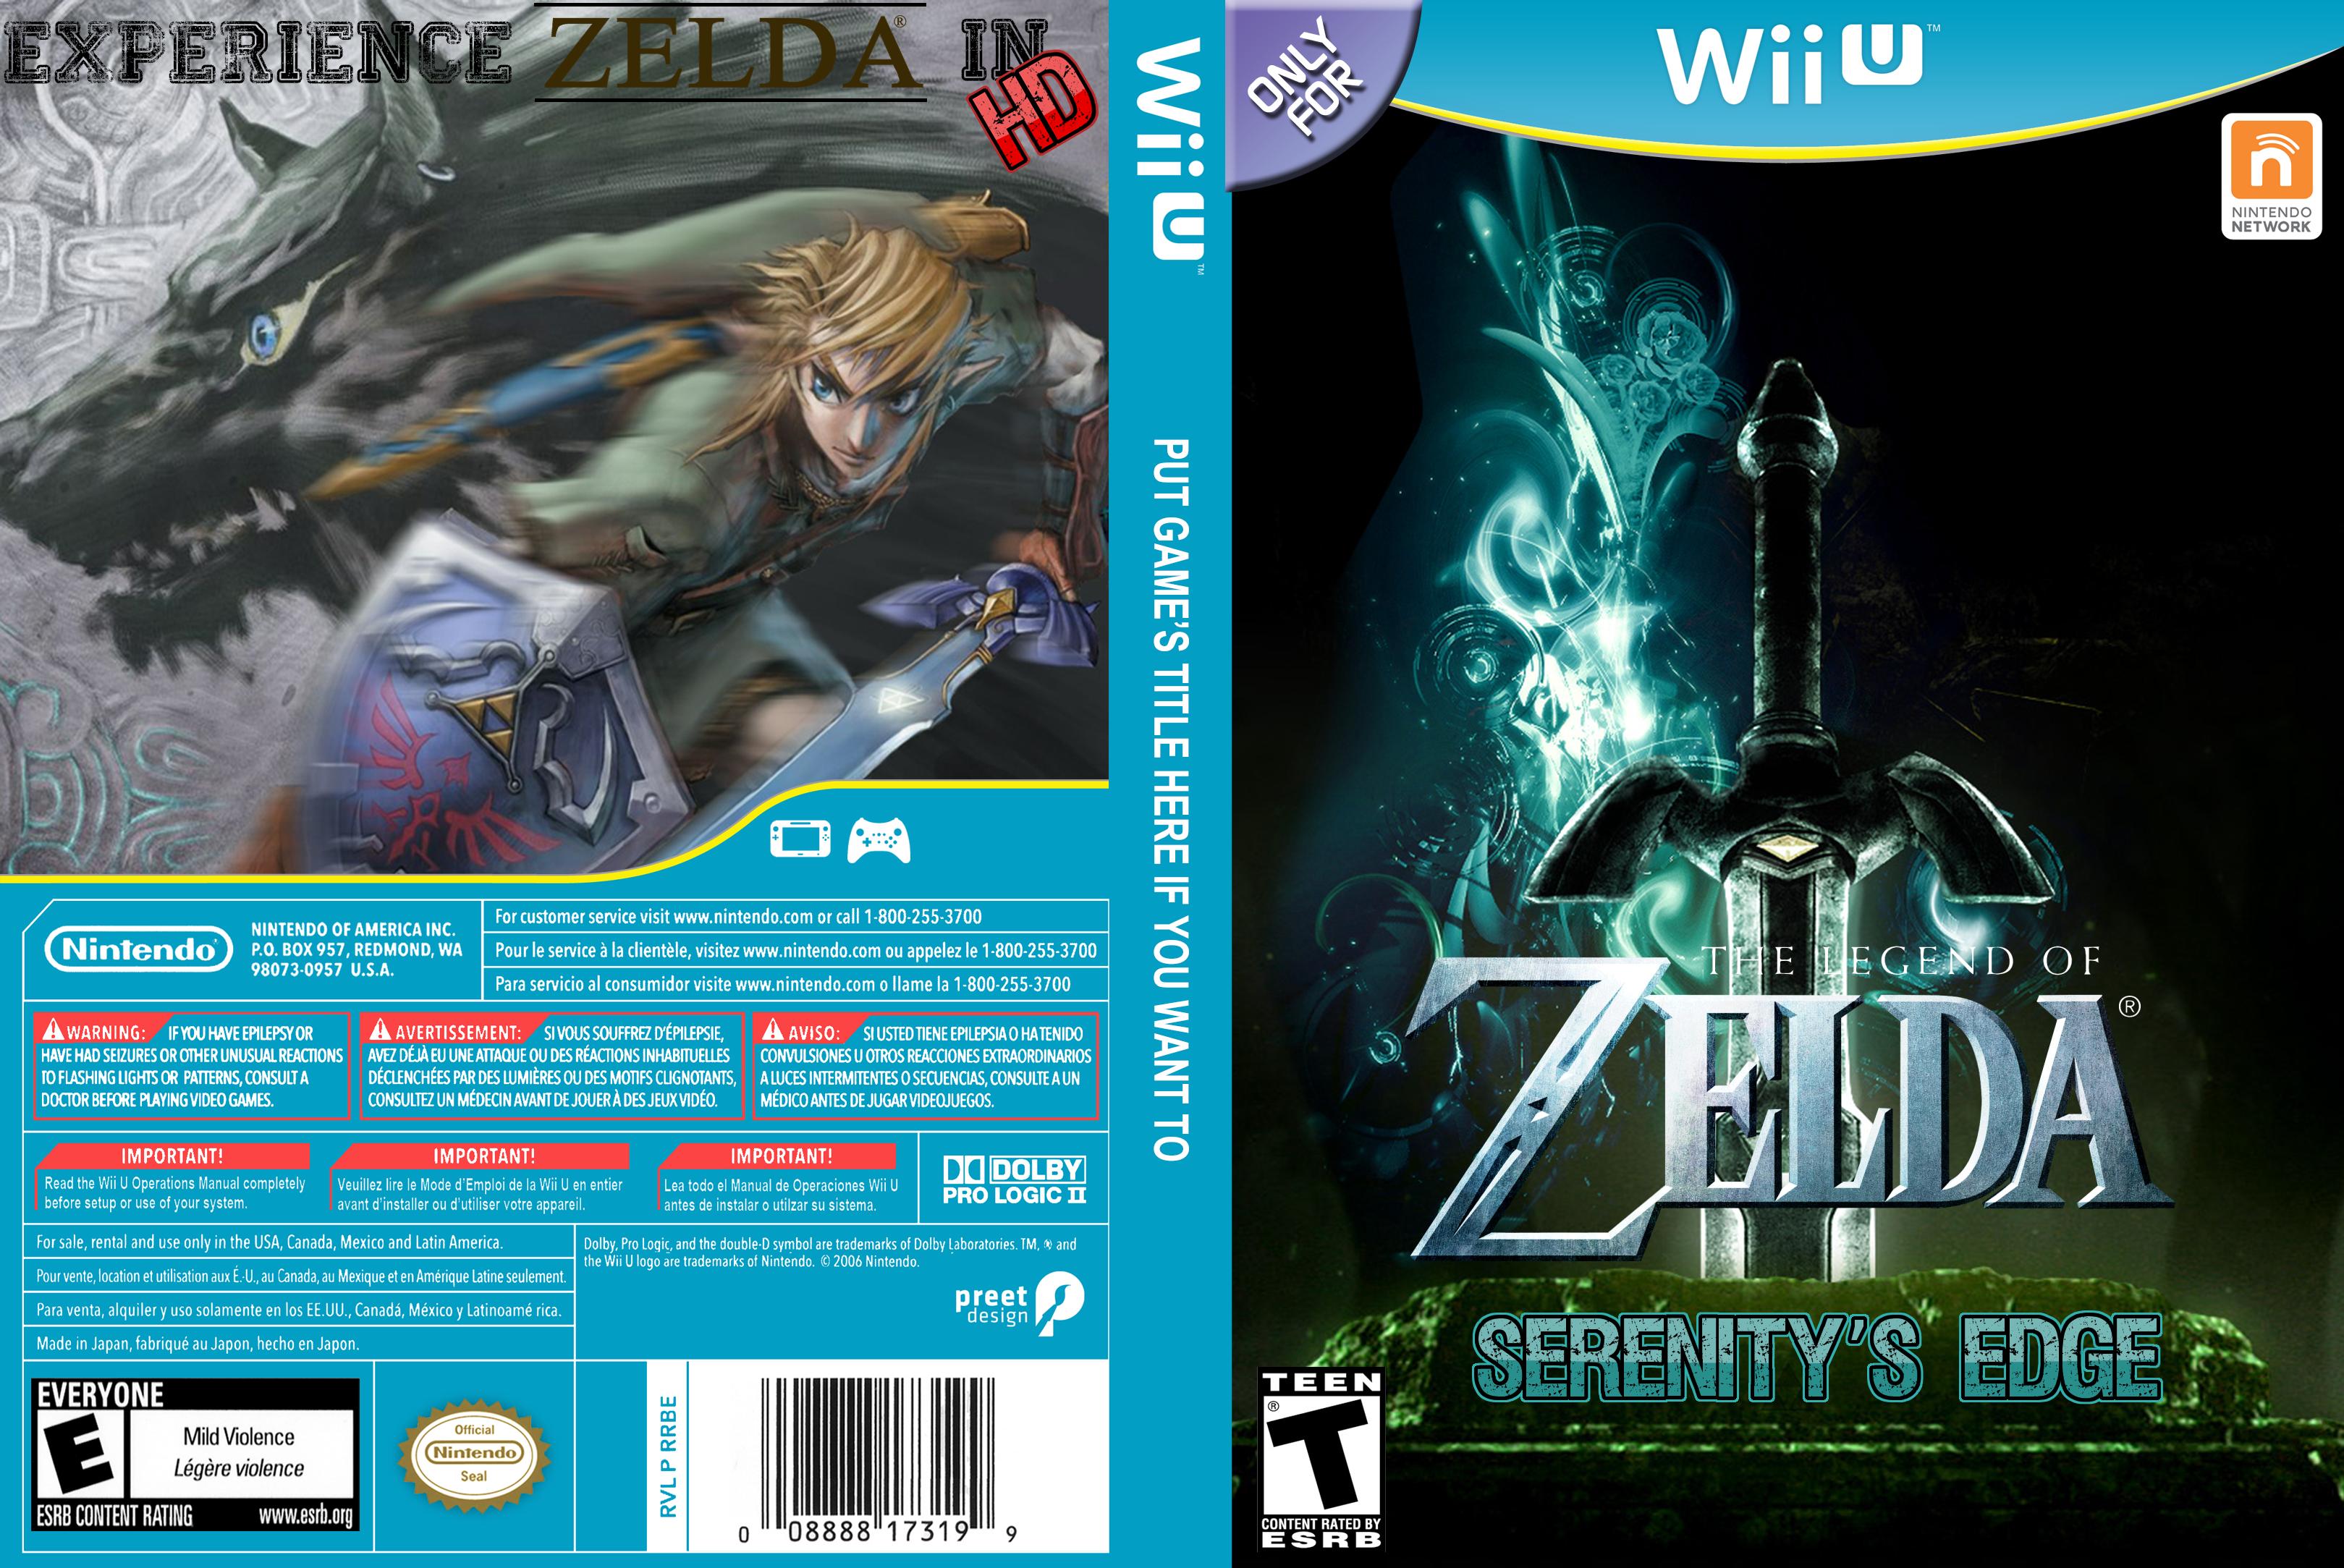 Wii U Boxarts De Games Do Wii U